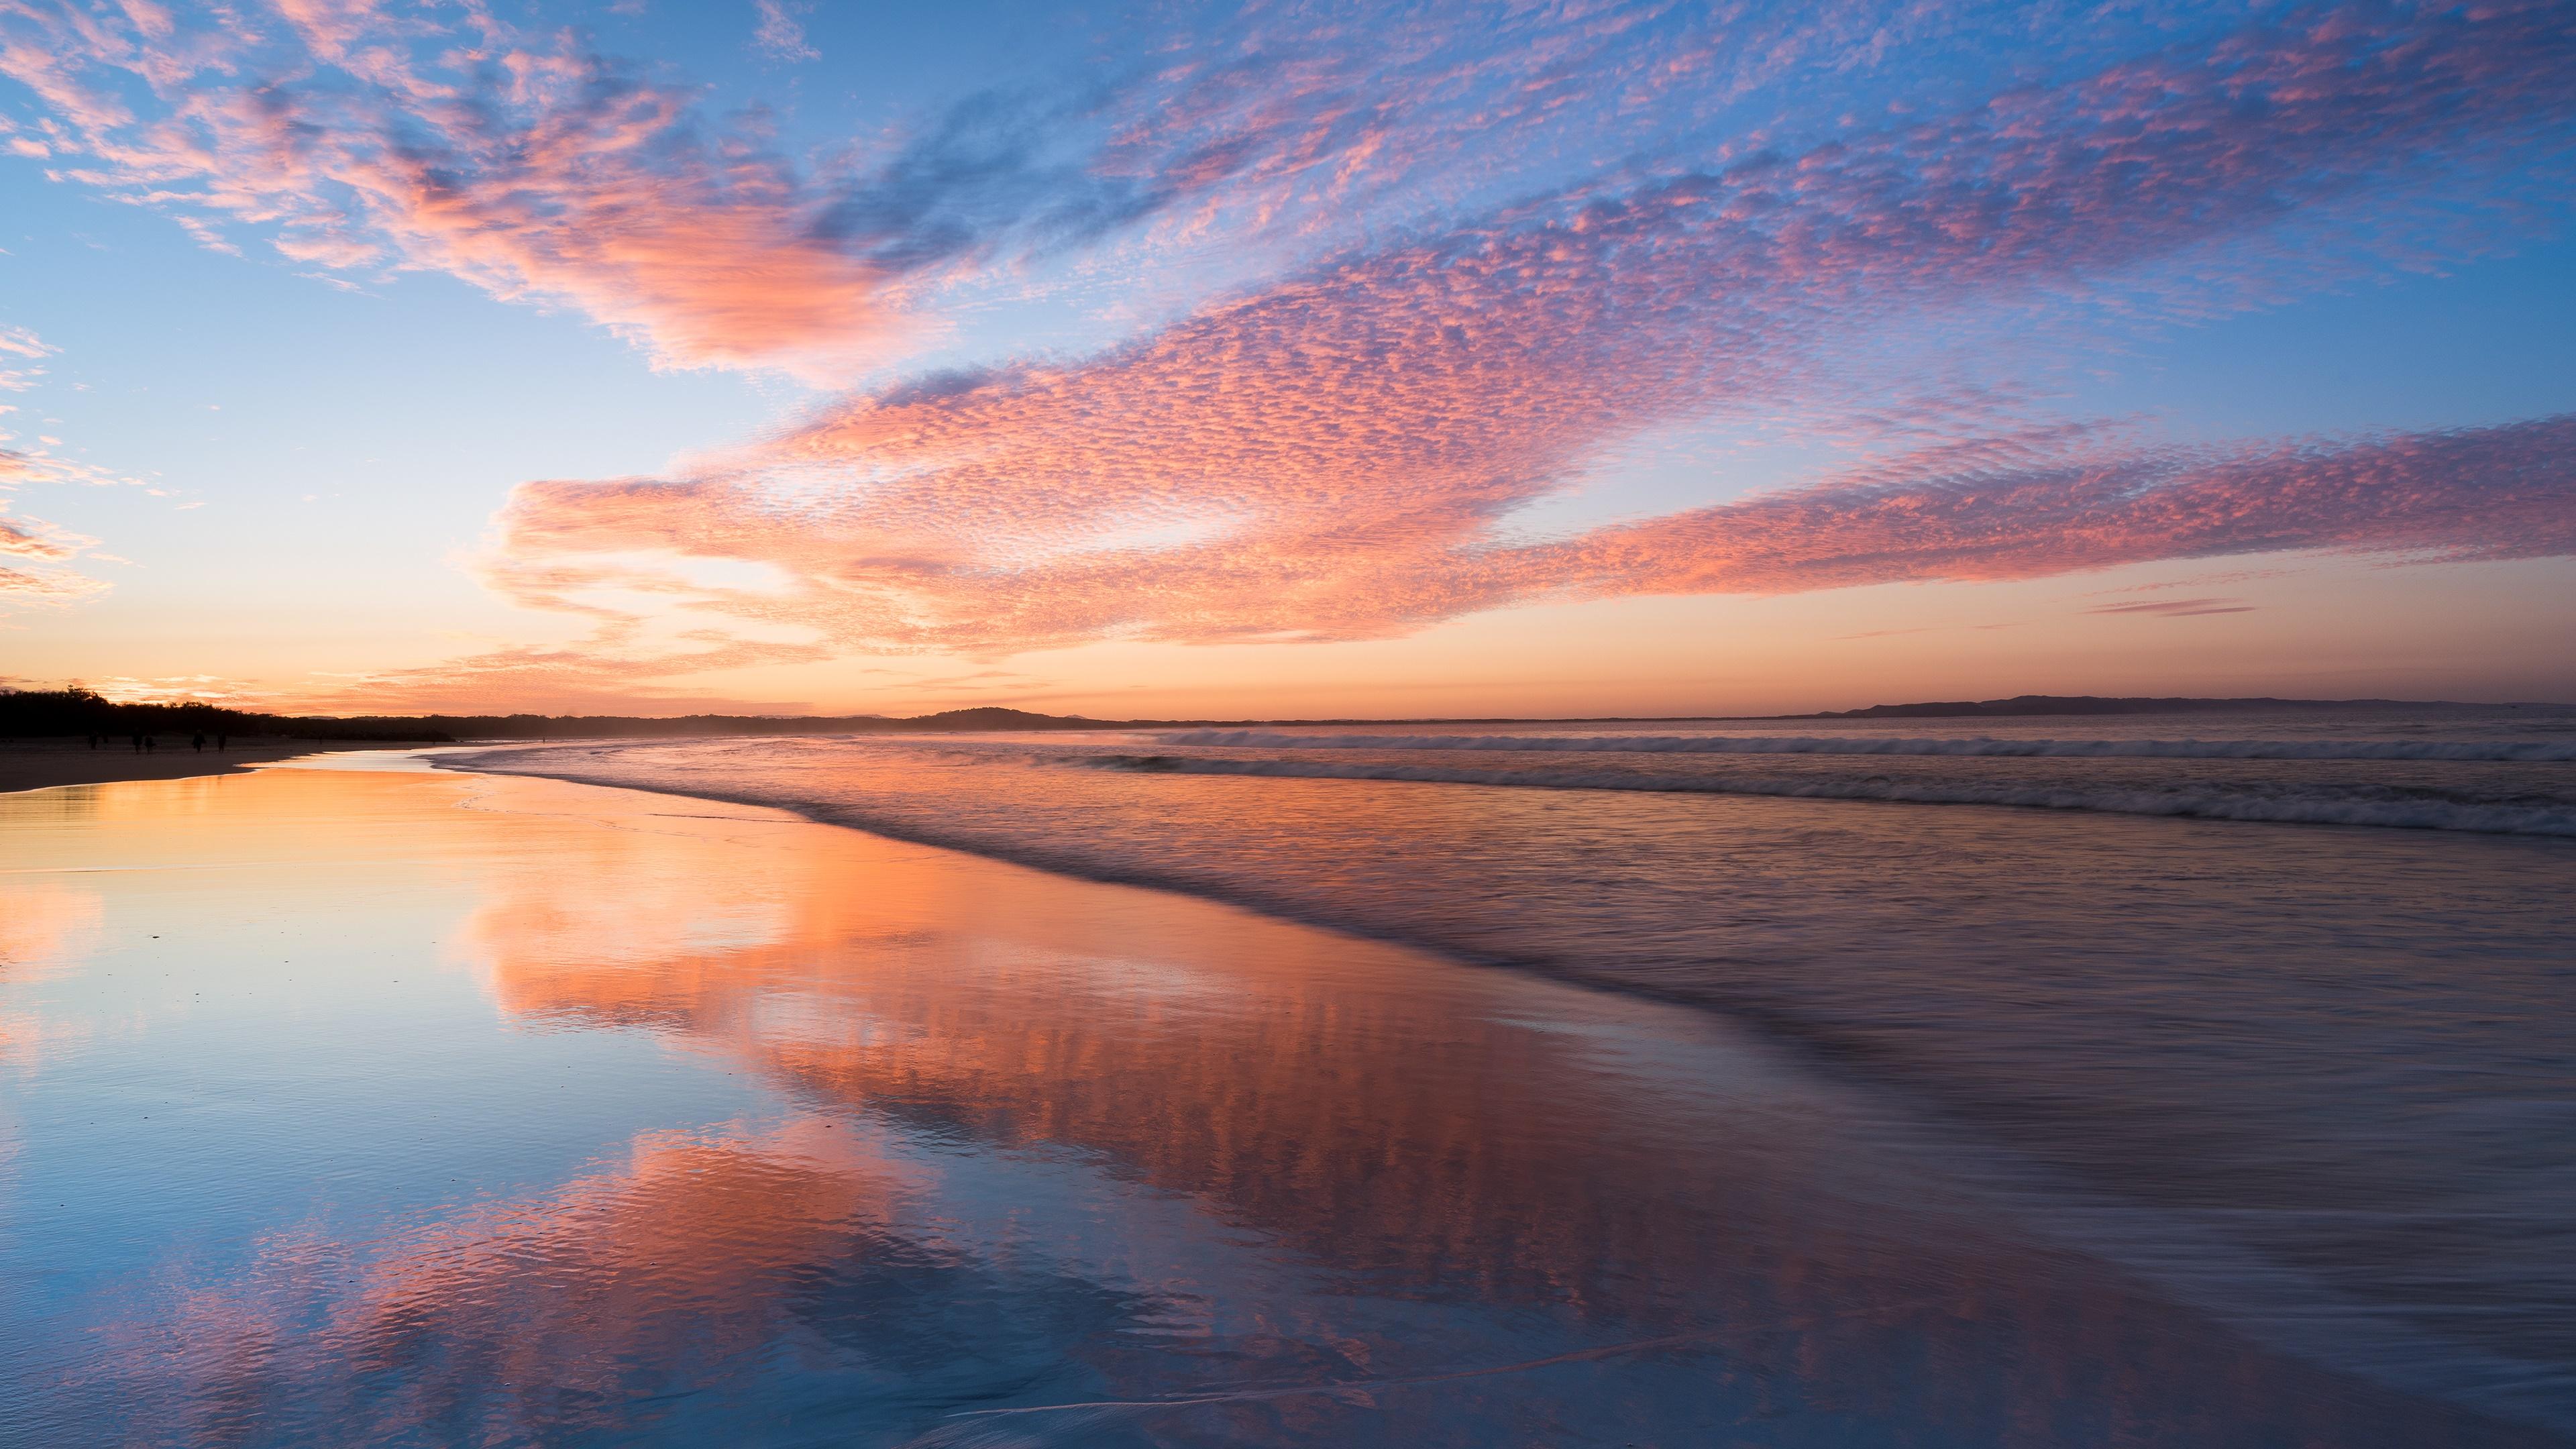 Sunrise reflection wallpaper